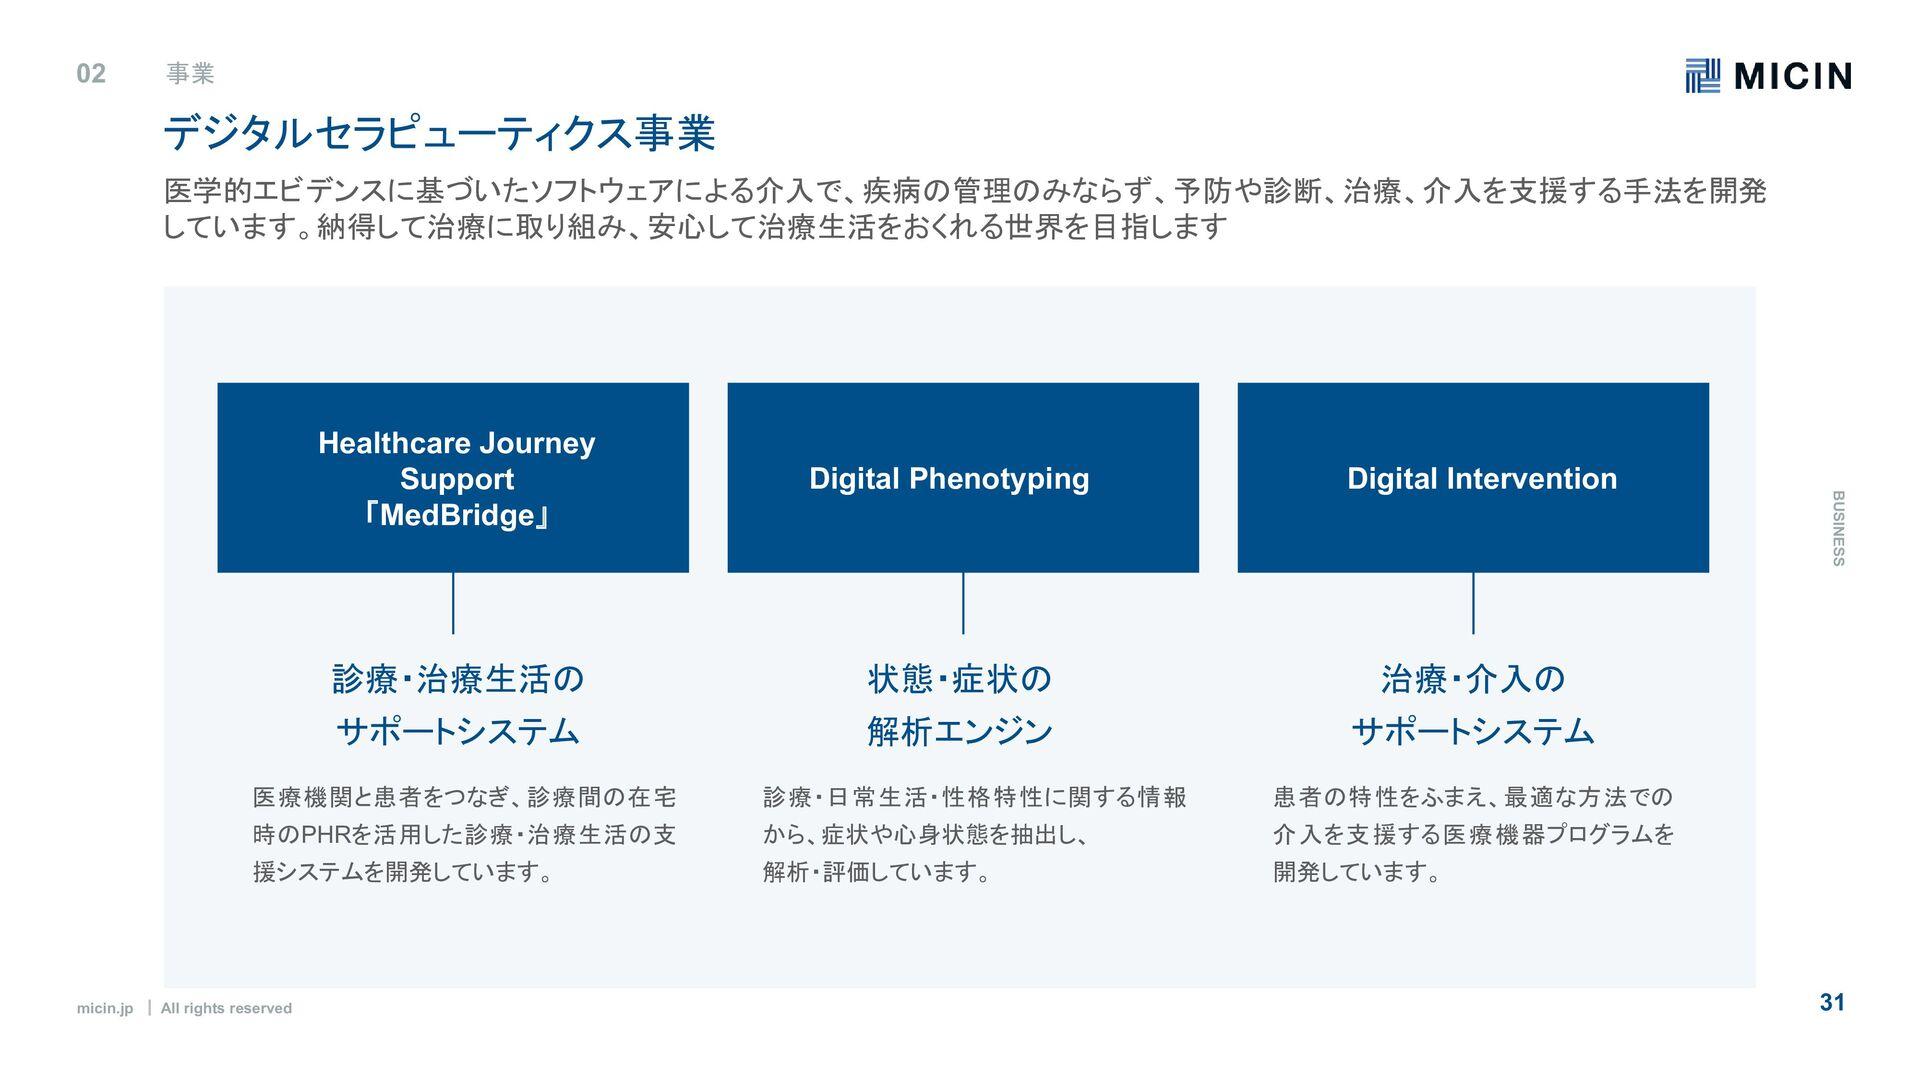 micin.jp   All rights reserved 31 オフィス環境 ミーティング...